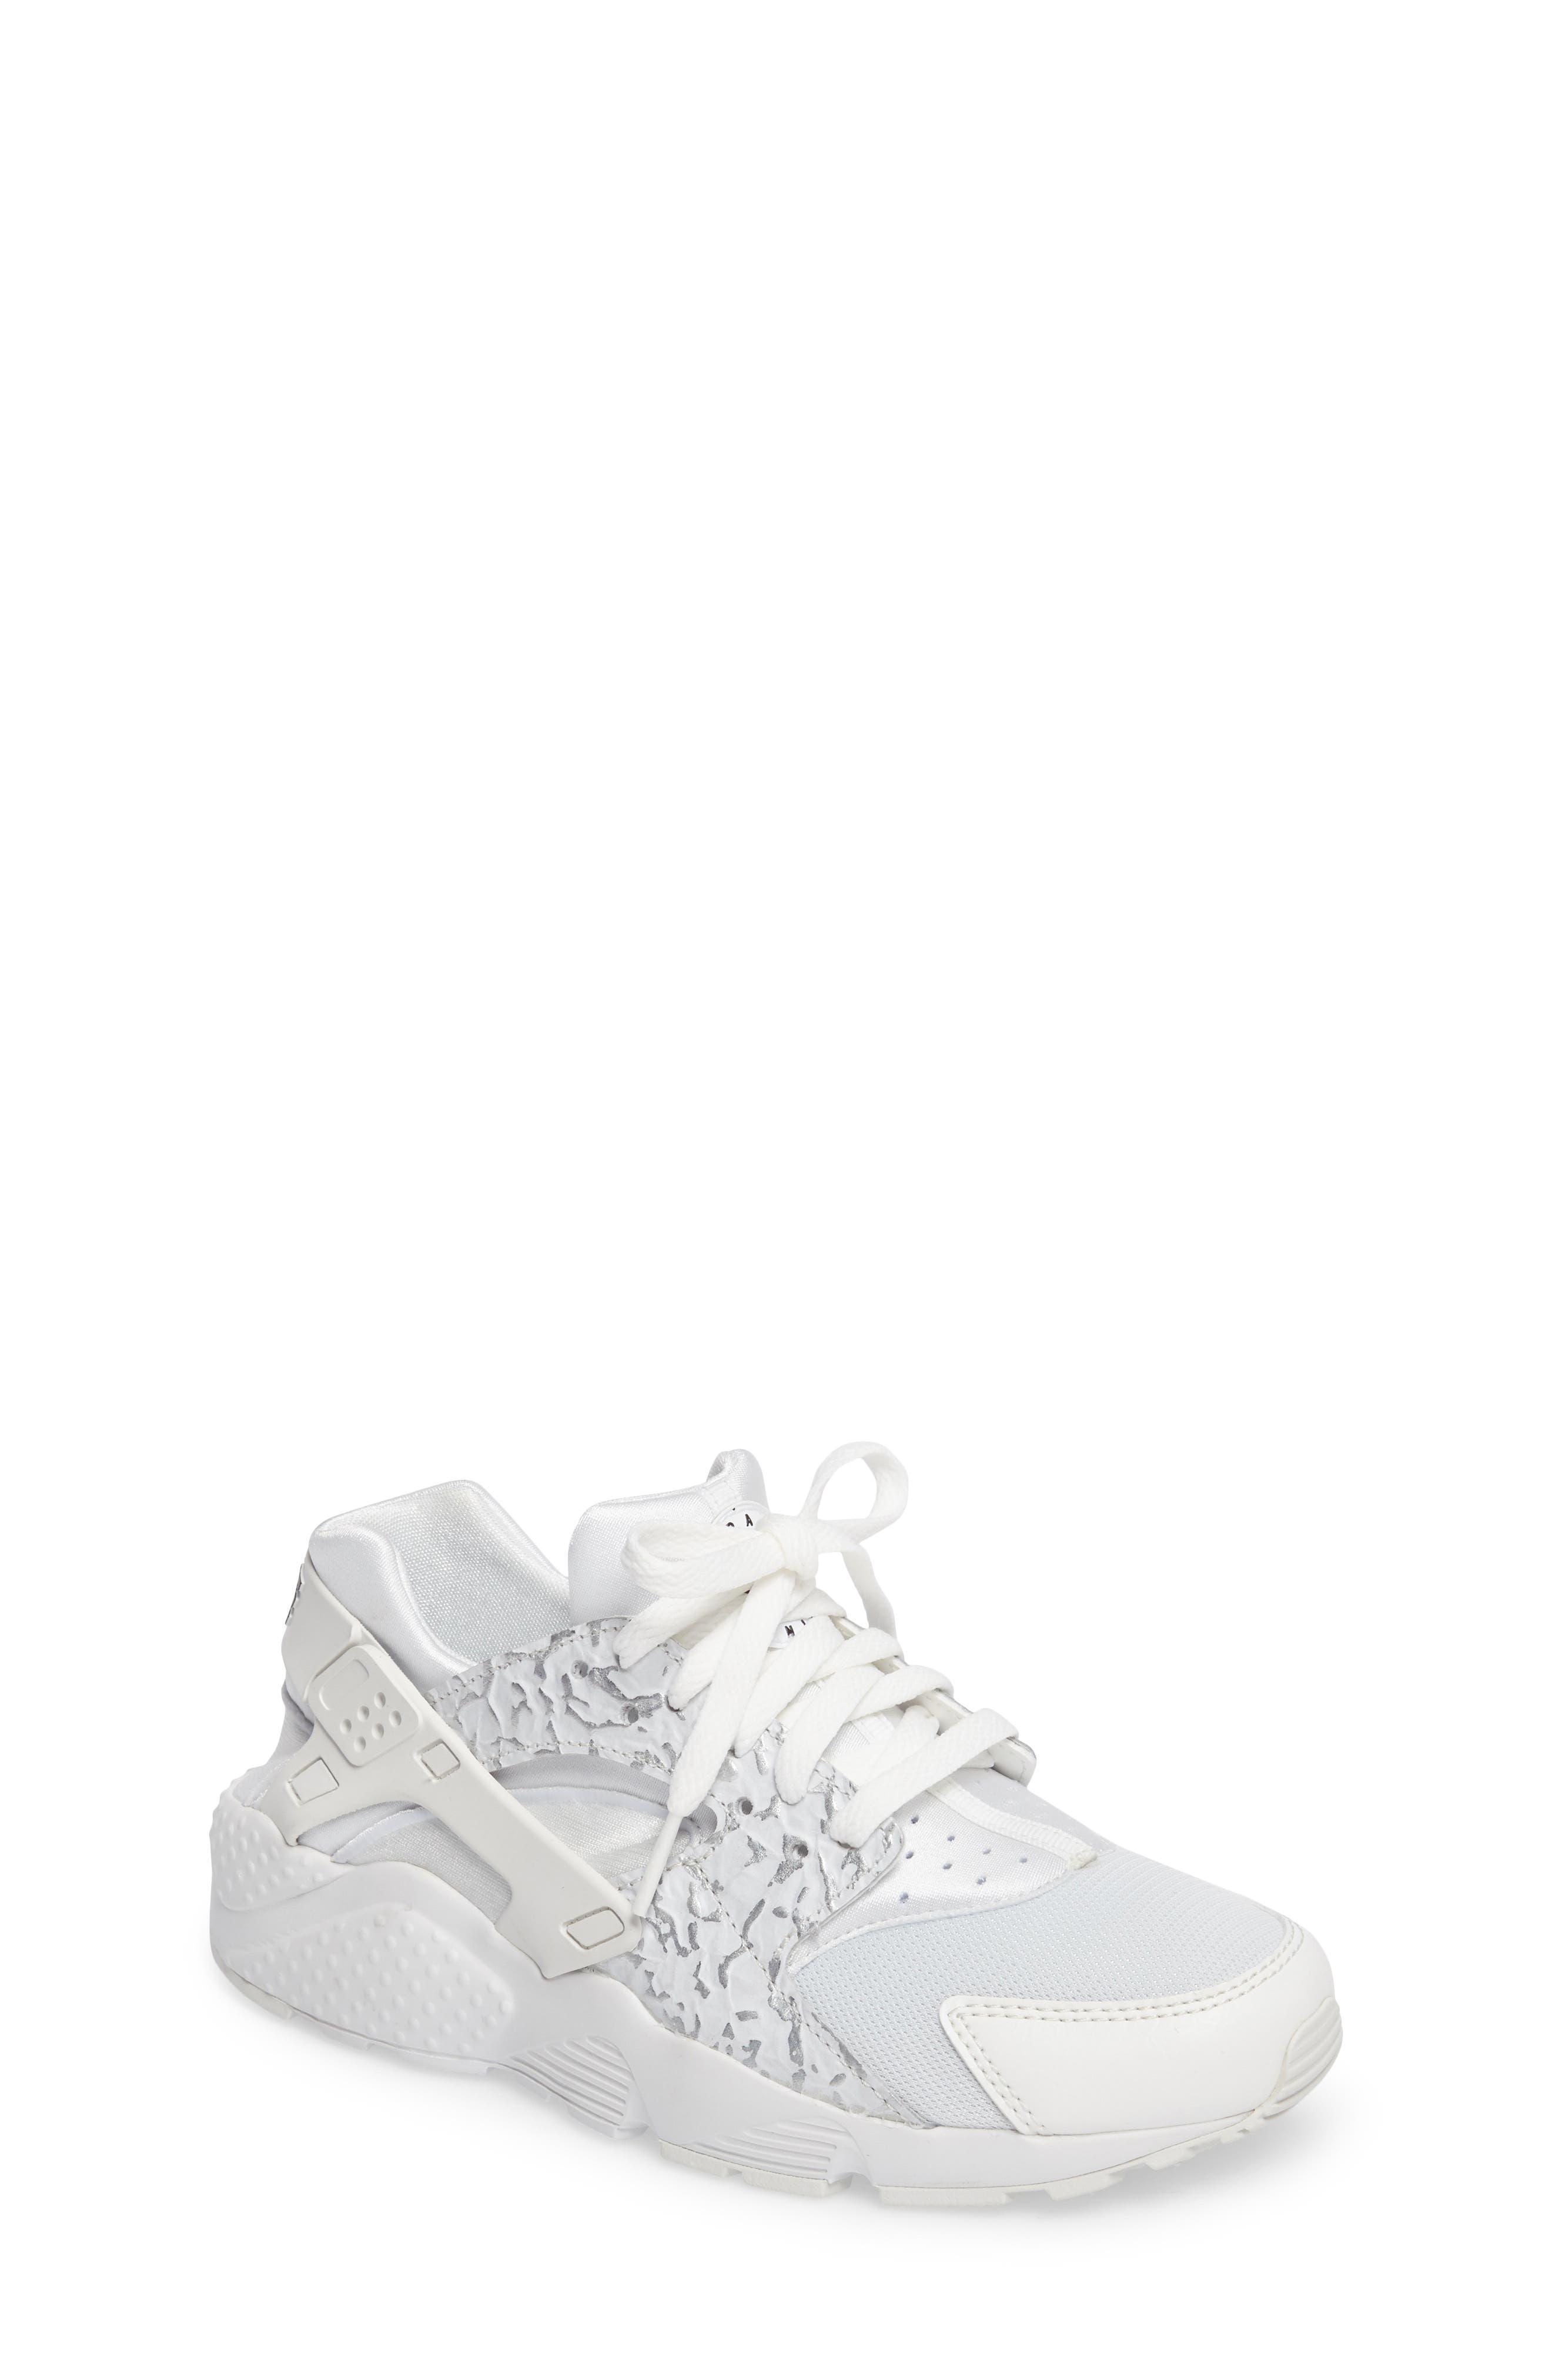 Huarache Run SE Sneaker,                             Main thumbnail 5, color,